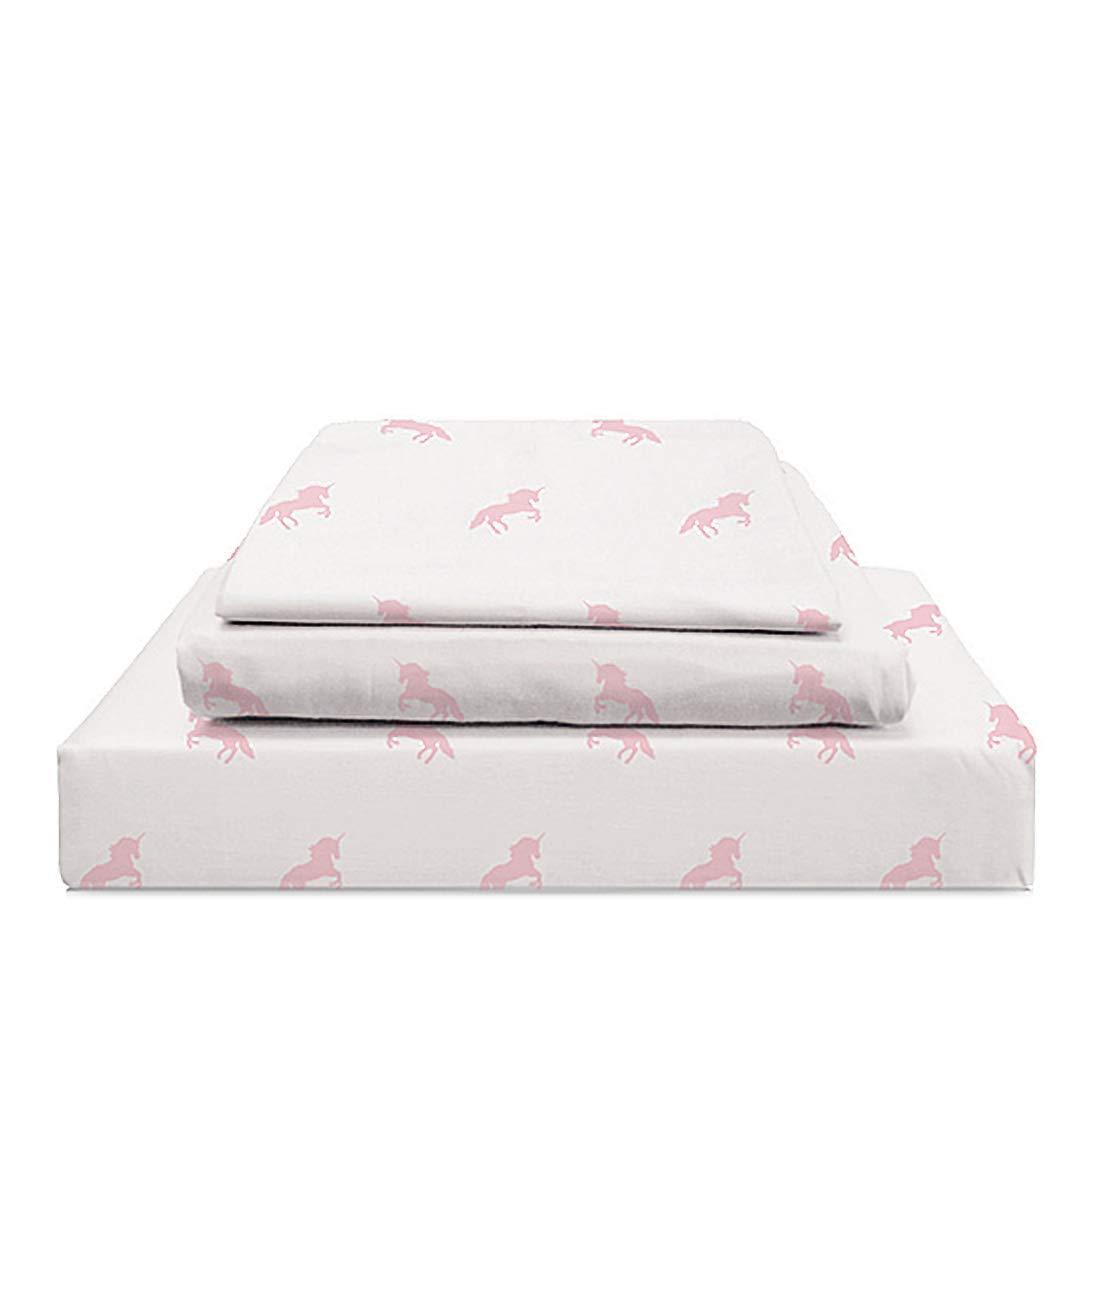 Habitat Kids Collection Unicorn Sheet Set in Pastel on White - 100% Organic Cotton Unicorn Sheets for Kids (Pink, Twin)